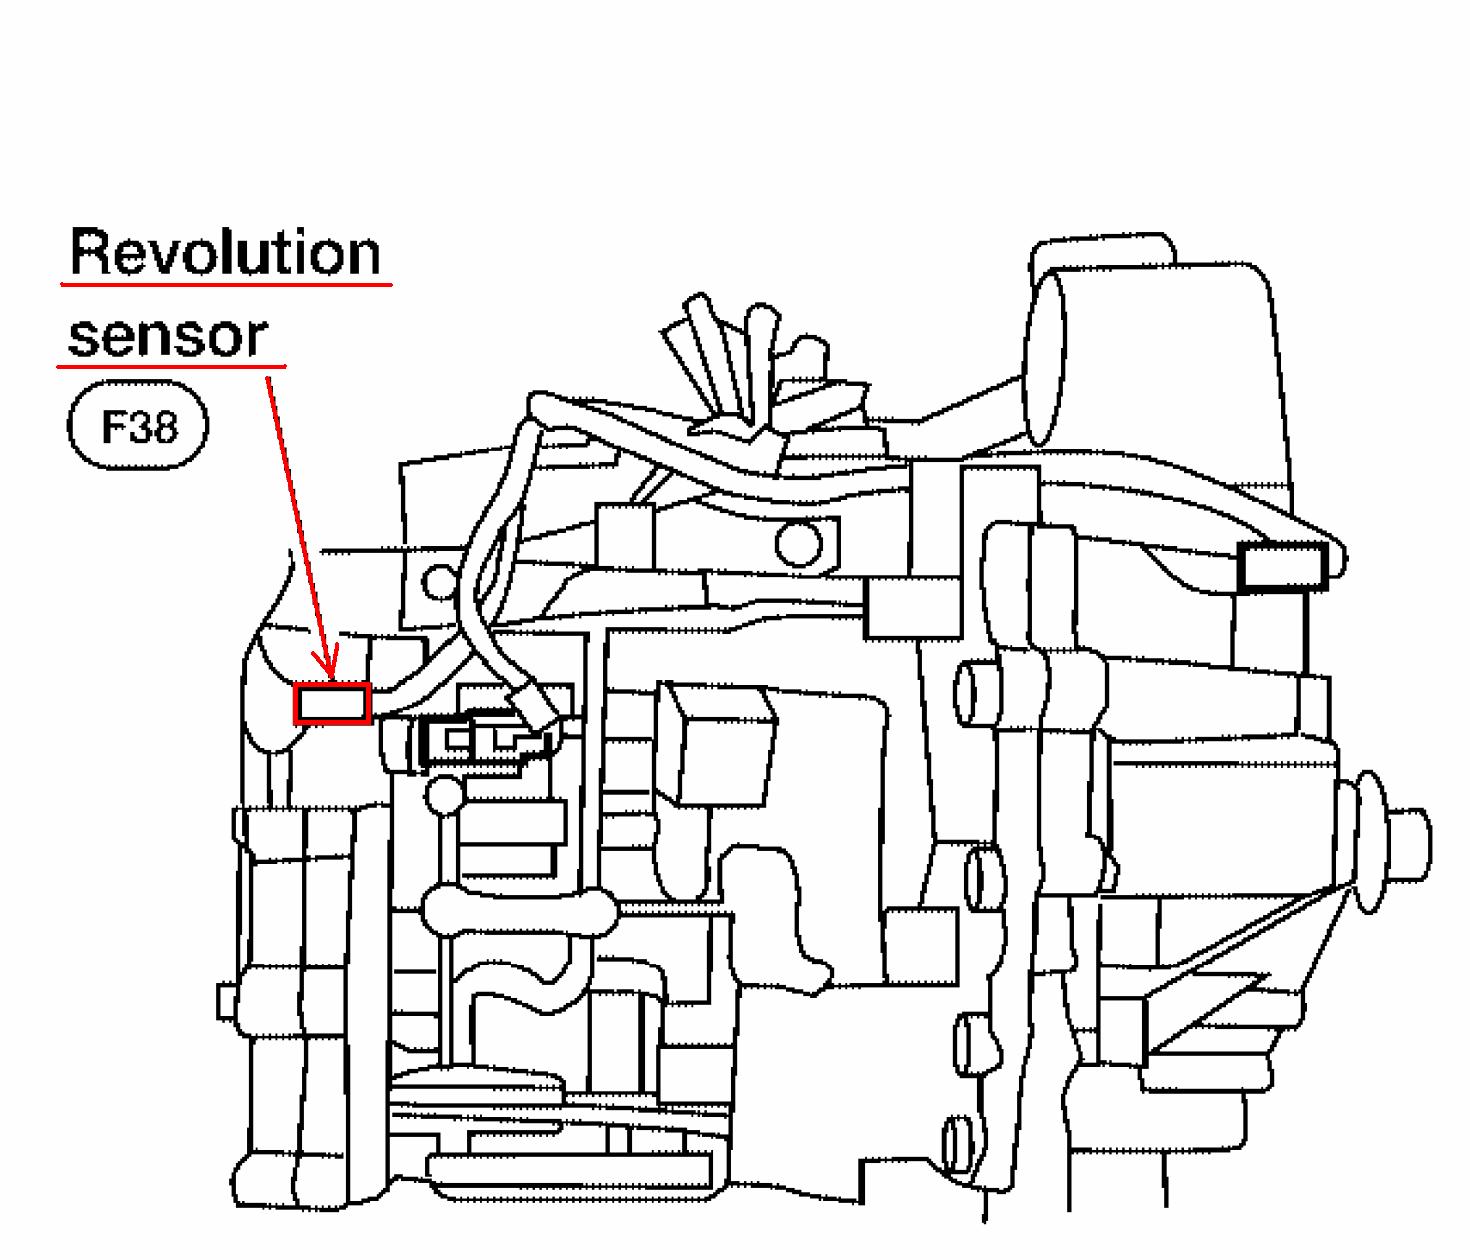 Fleetwood Revolution Wiring Diagrams Electrical 2004 Battery Diagram Schematic 2005 Nissan Altima Sensor